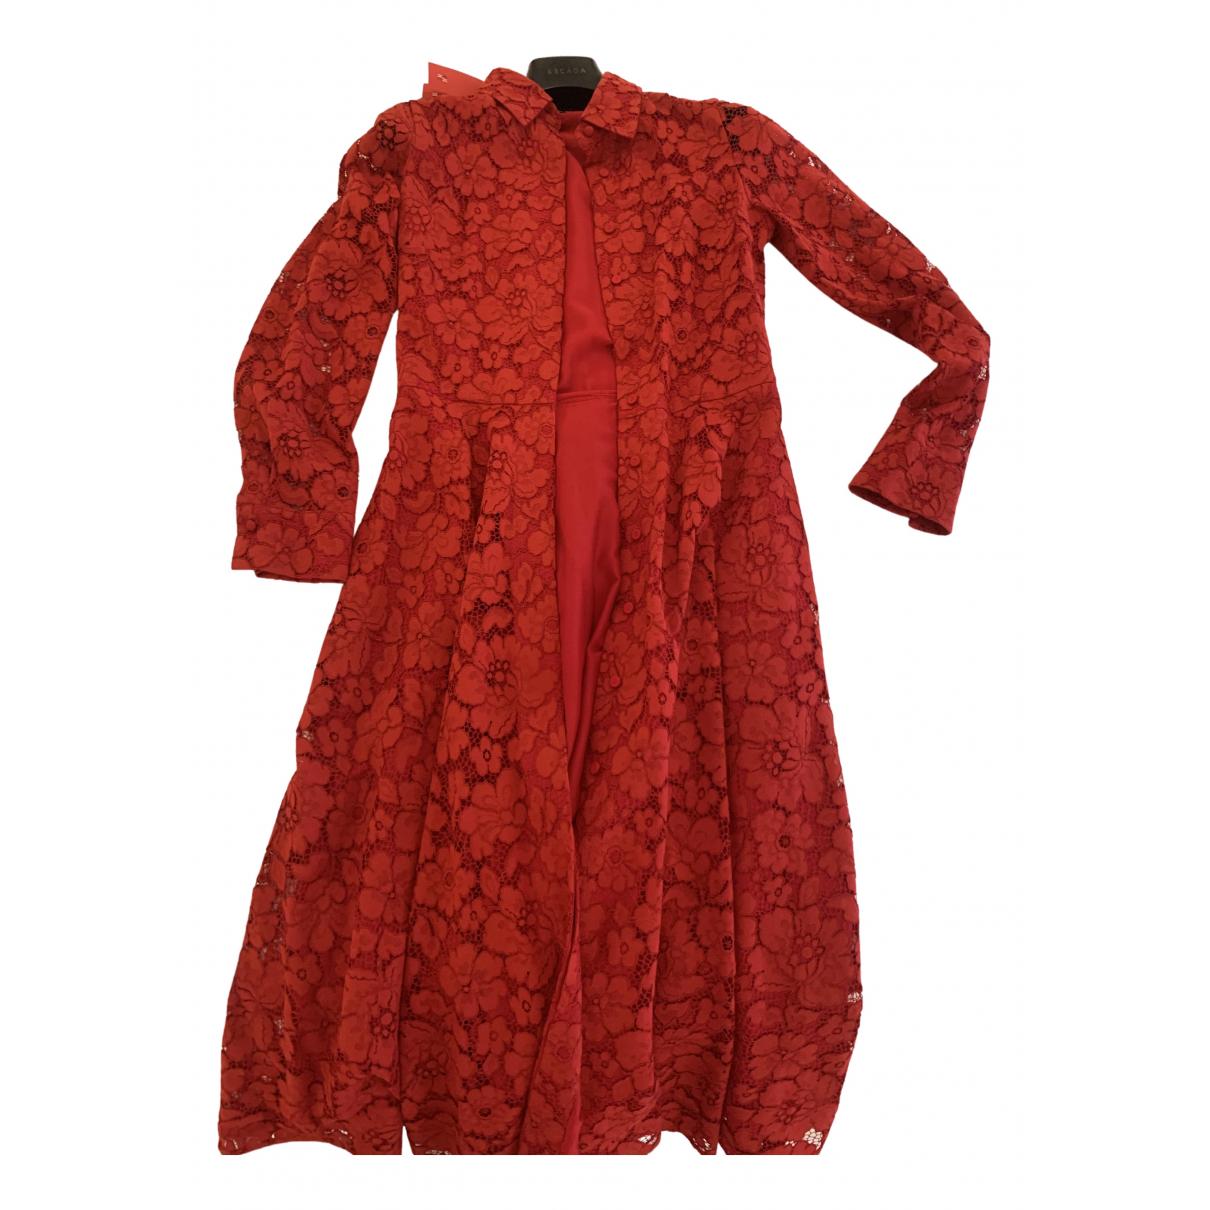 Carolina Herrera \N Red Lace dress for Women 0 0-5